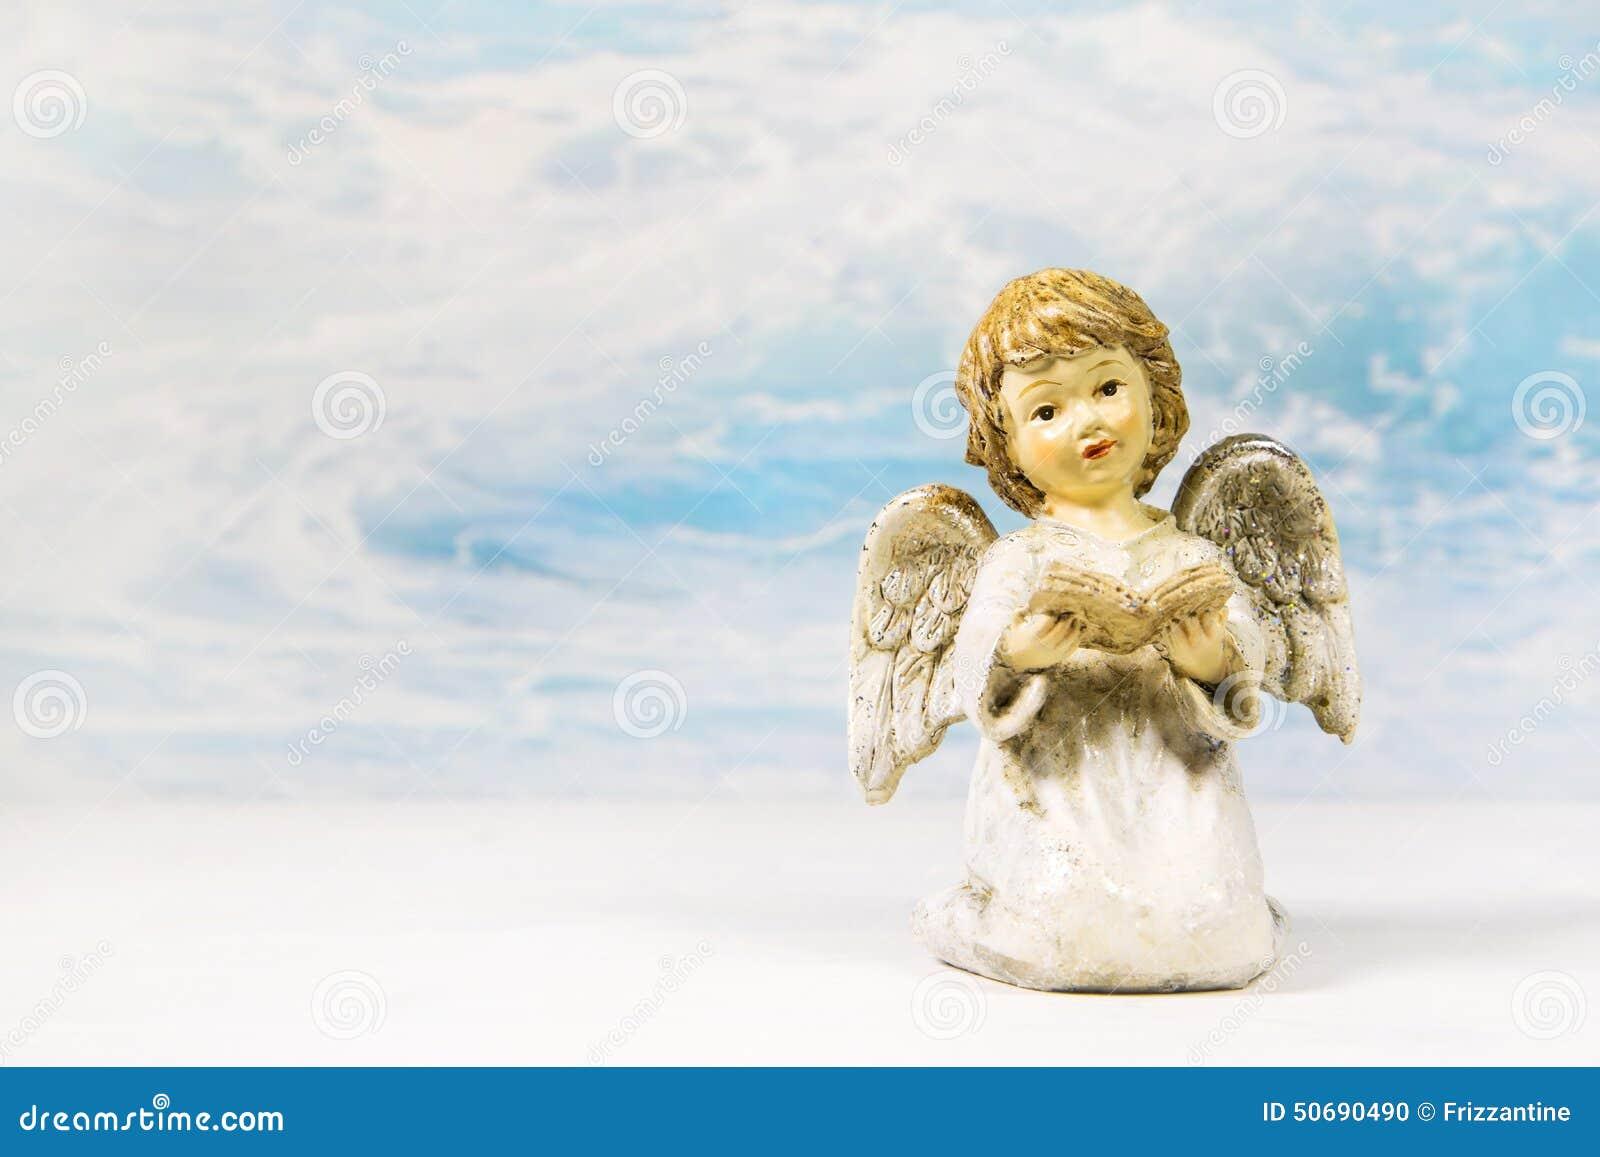 Download 圣诞节在讲的书的天使读书xmas的一个故事 库存照片. 图片 包括有 看板卡, 分娩, 装饰, 历史记录 - 50690490